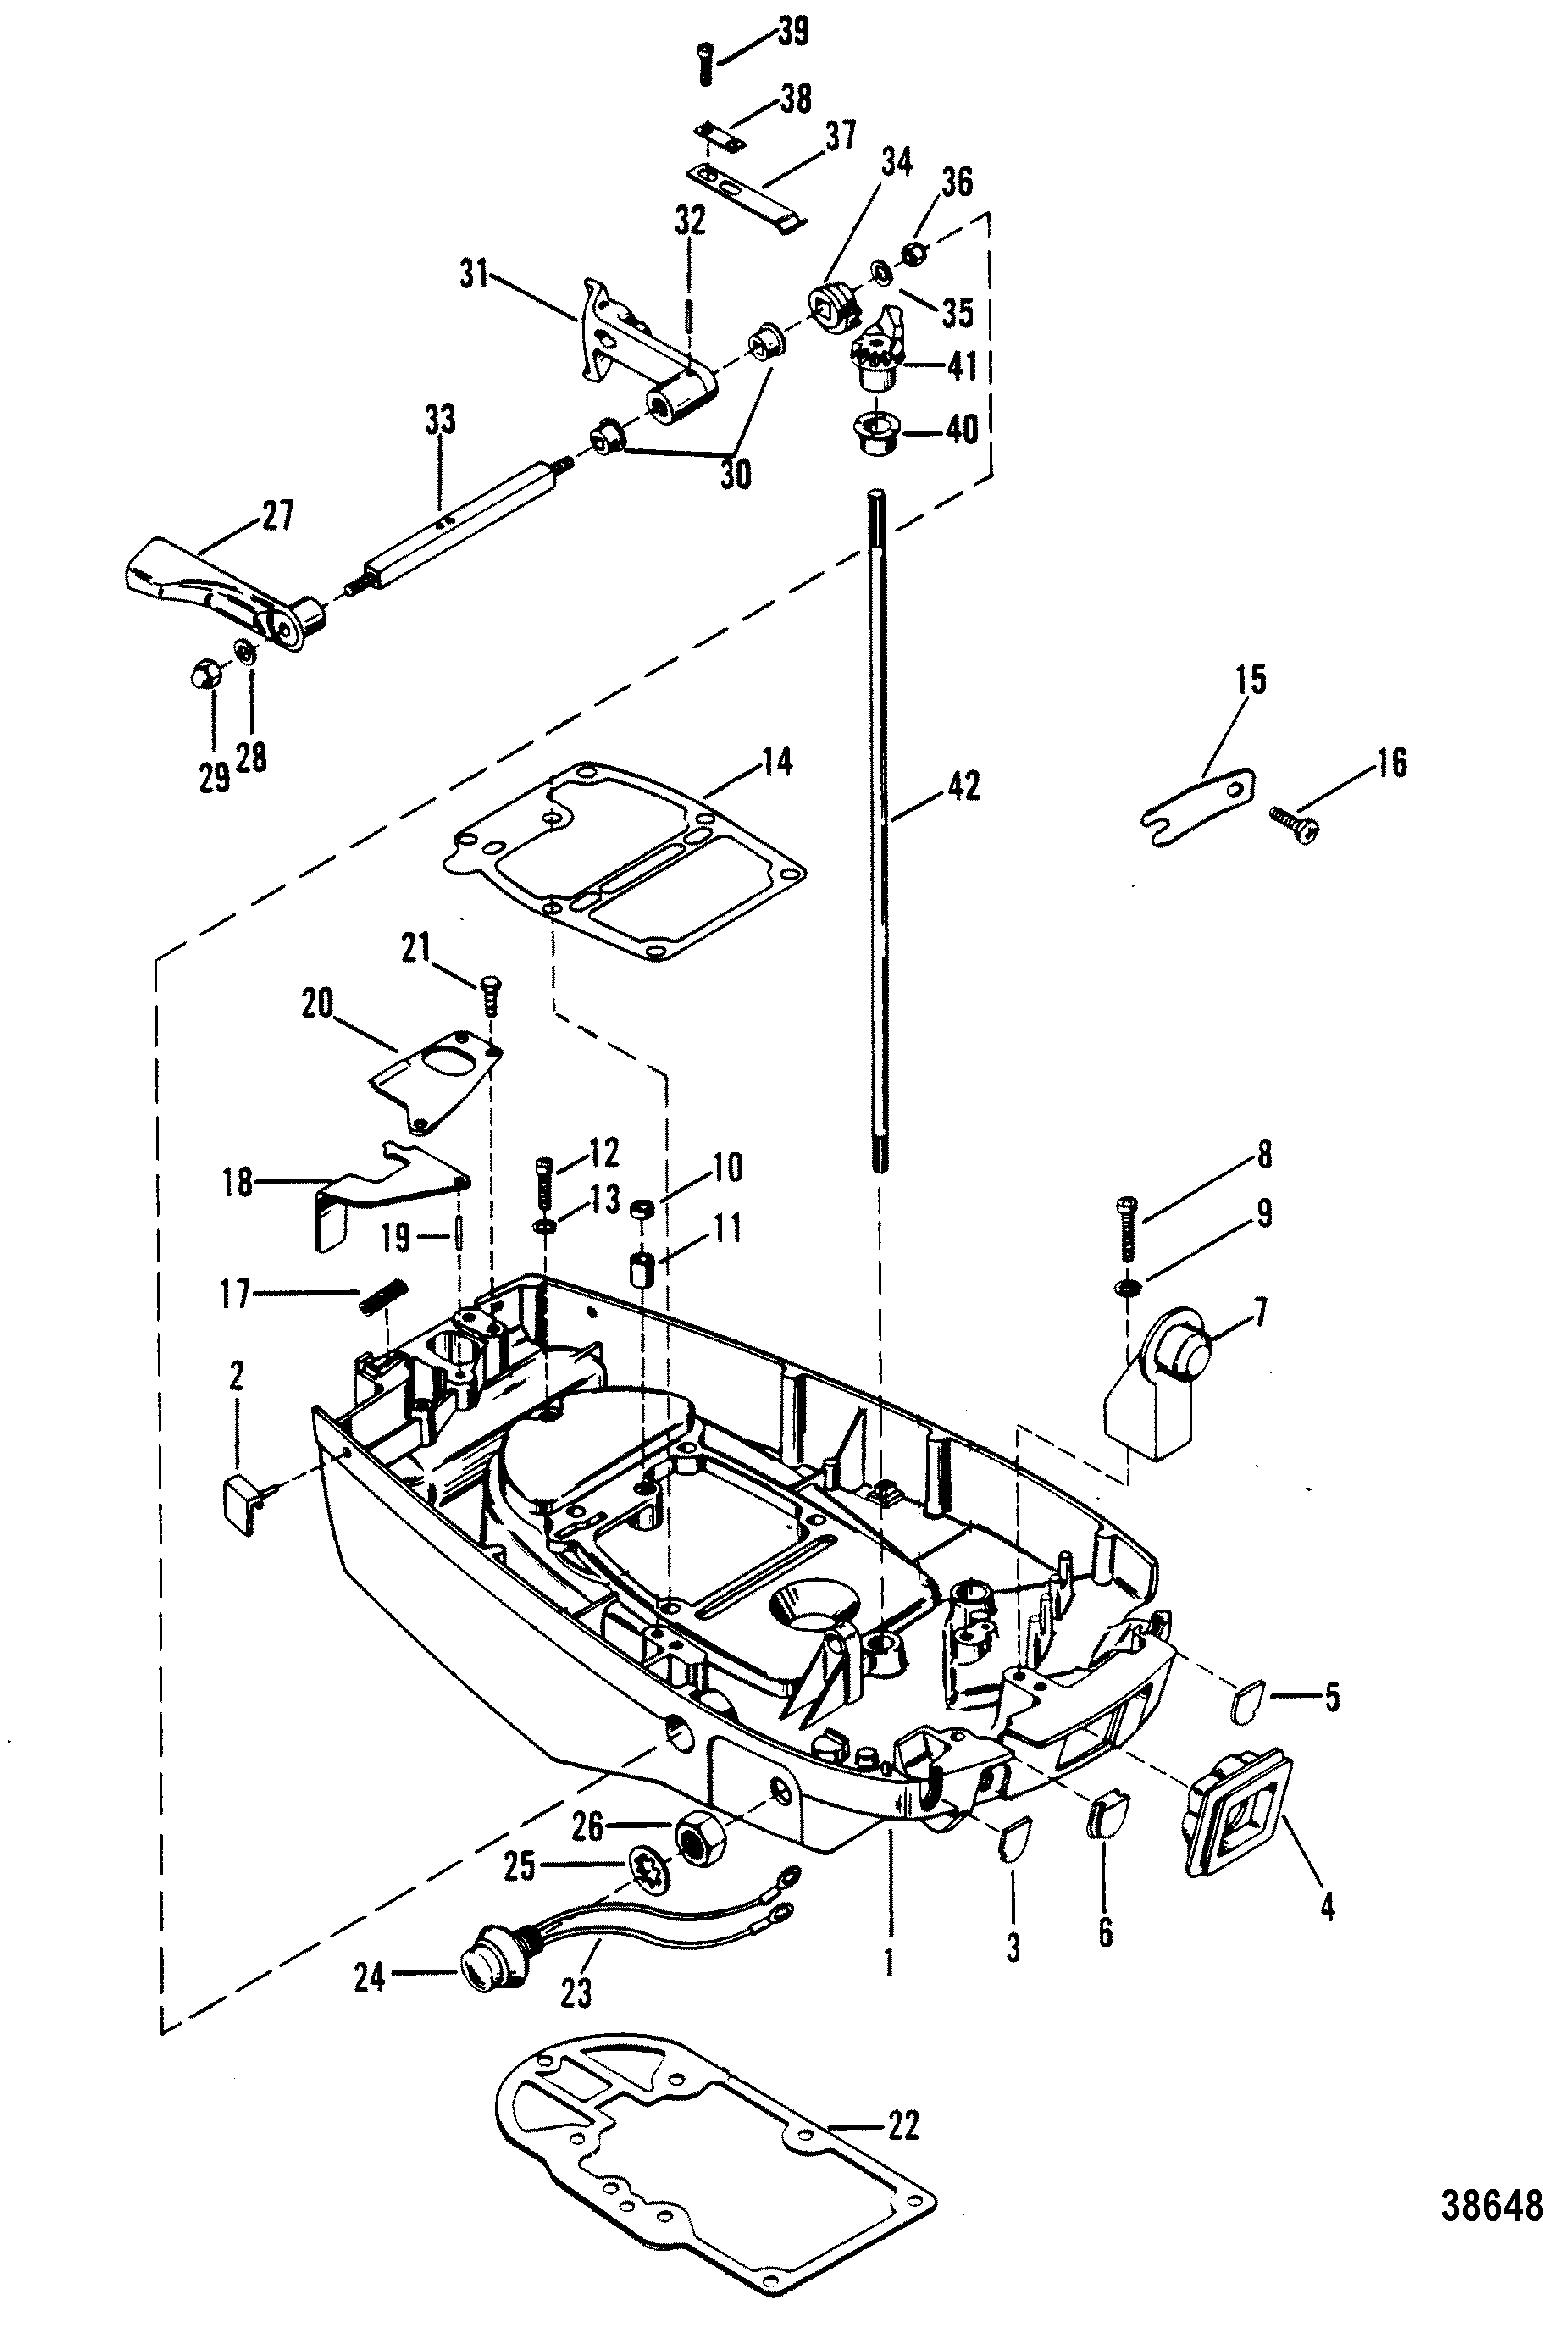 free 1995 30 hp mariner outboard motor service manual